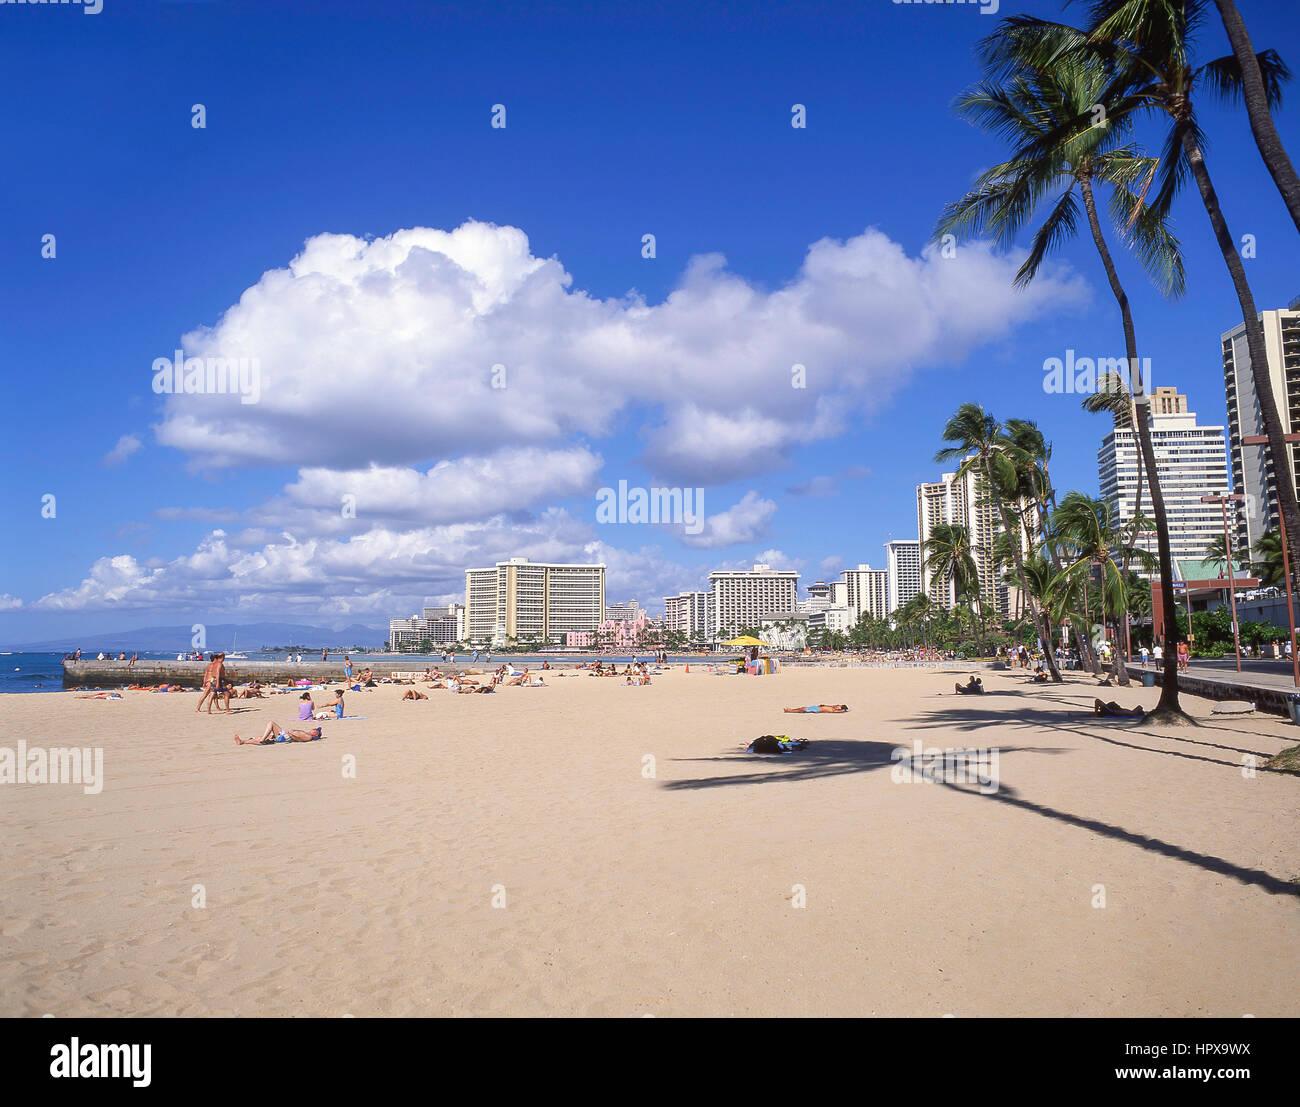 Waikiki Beach, Honolulu, Oahu, Hawaii, United States of America - Stock Image